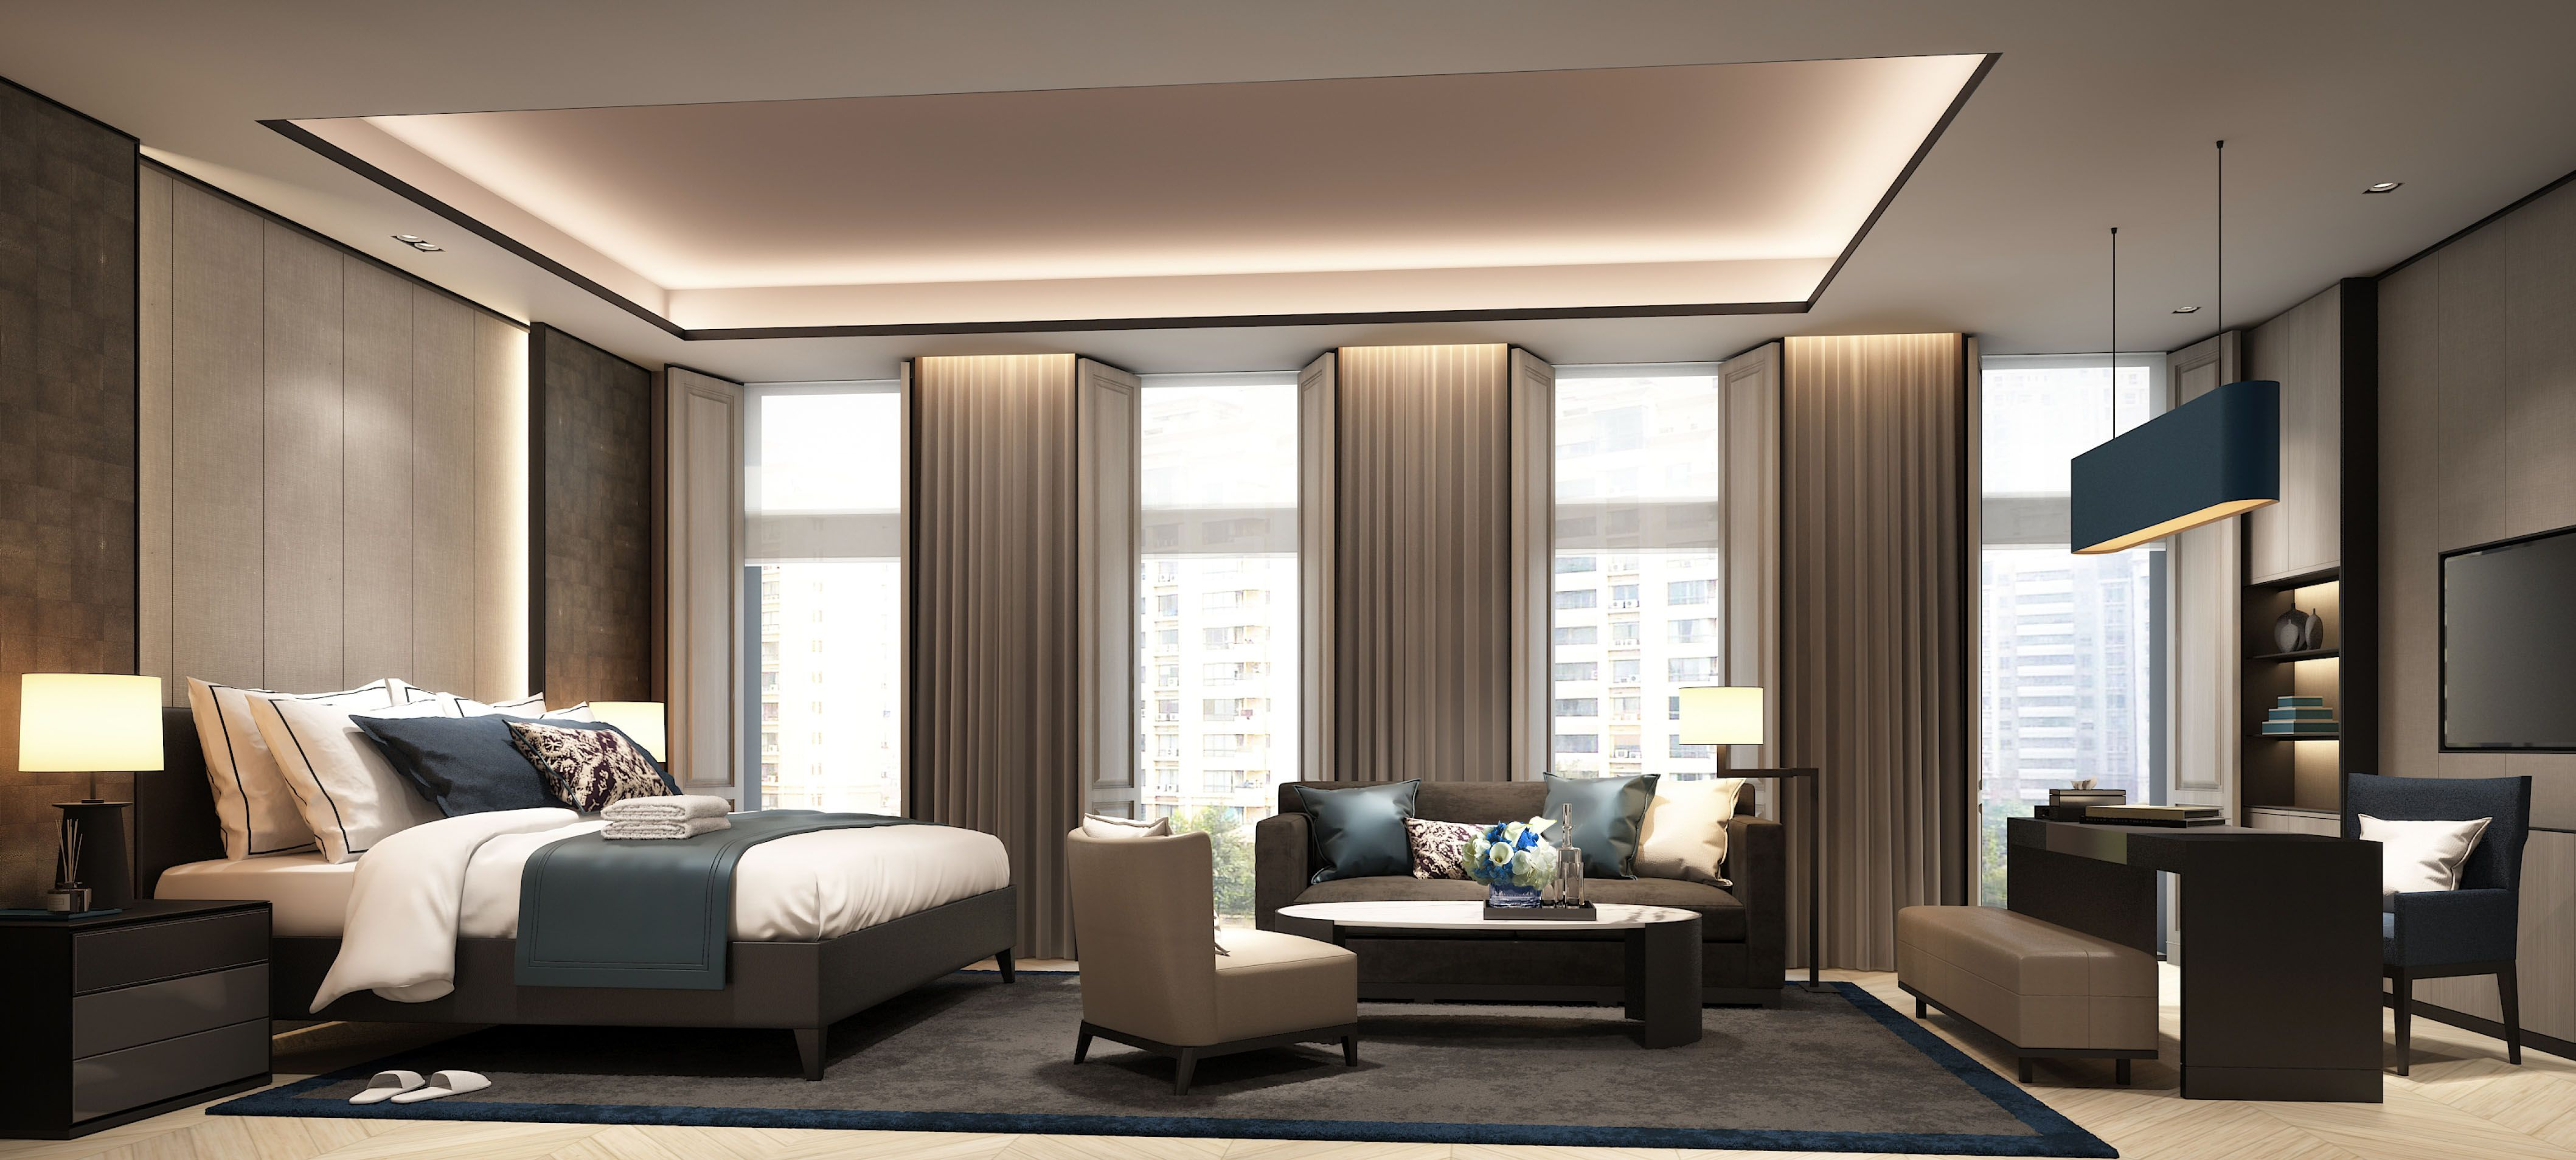 SCDA Hotel Development, Gurgaon, India- Superior Guestroom  City Hotels  Pinterest ...